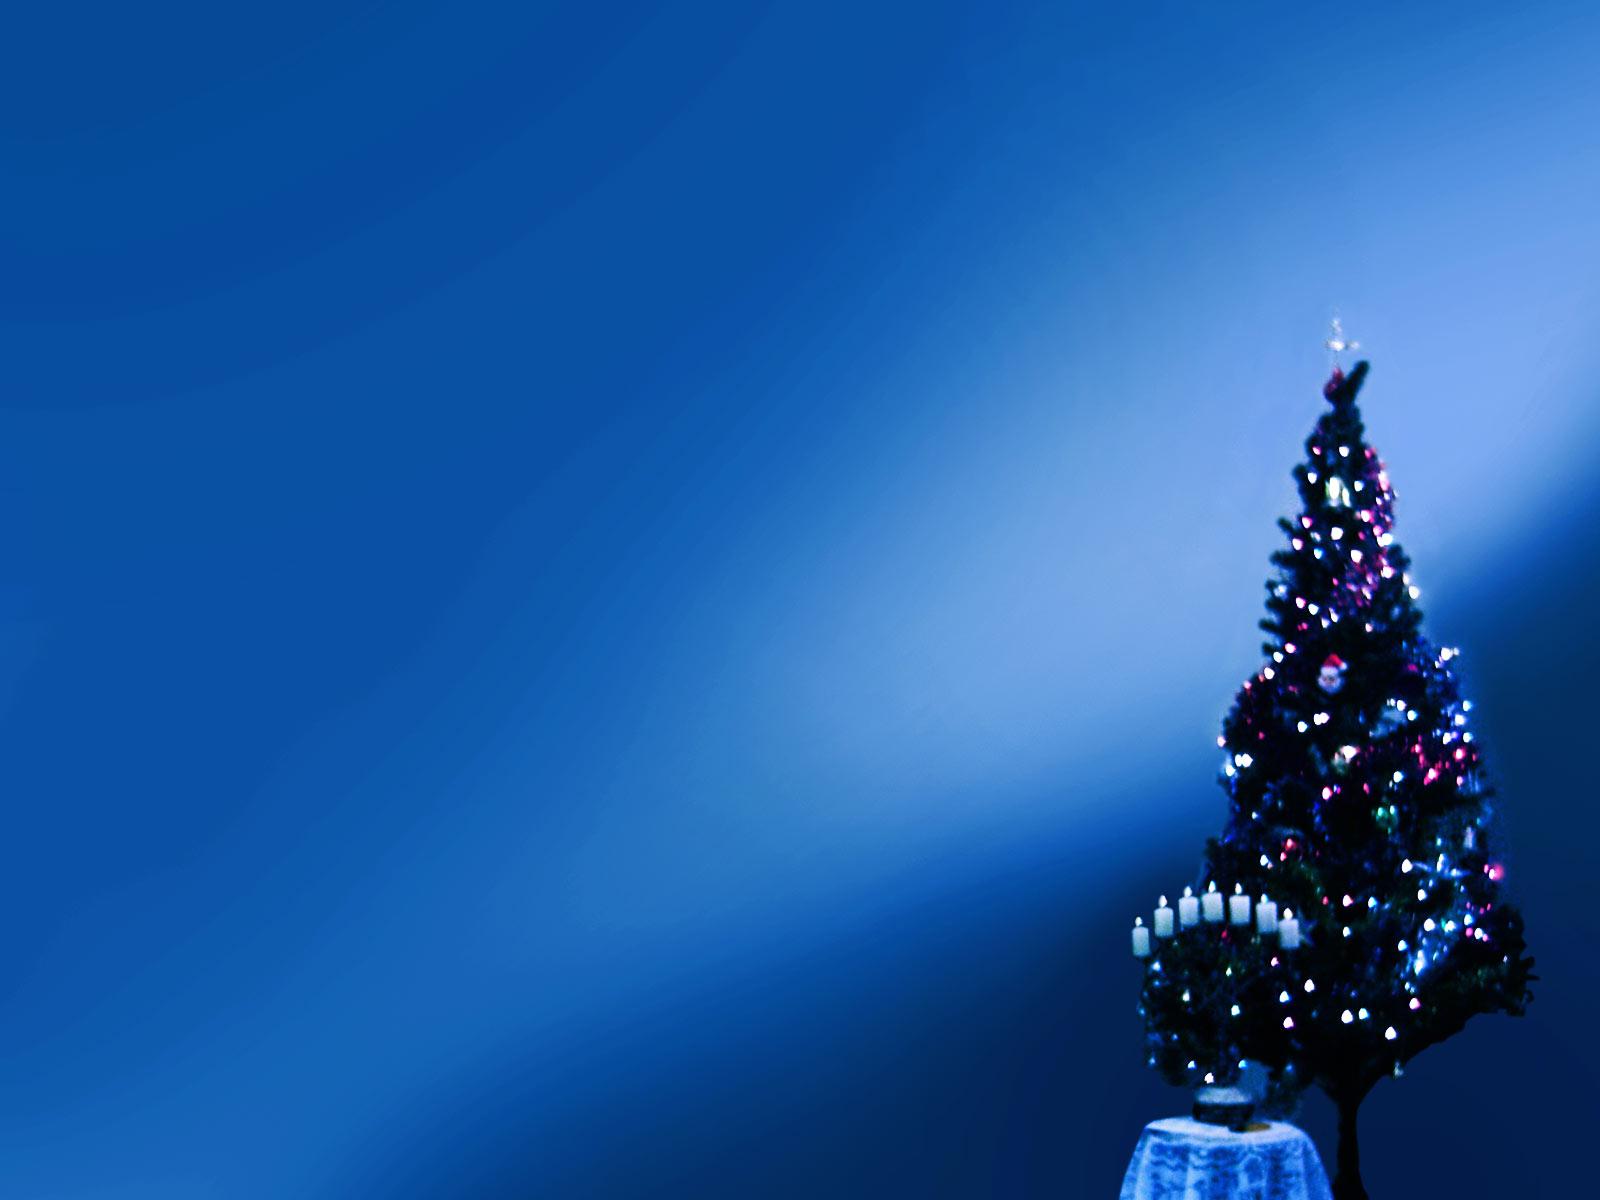 Xmas Themes Christmas Wallpapers Desktop Themes Cursors Pics   HD 1600x1200